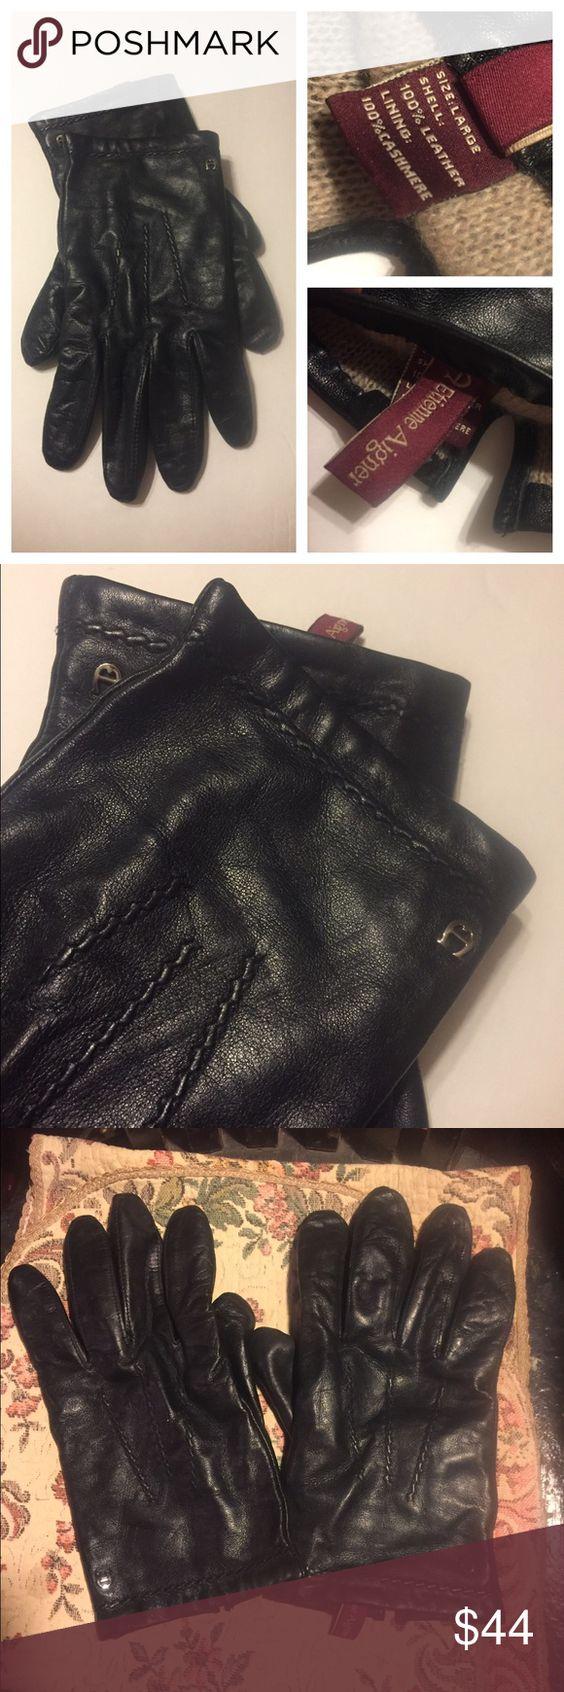 Etienne aigner black leather gloves - Etienne Aigner Black Leather Gloves 10